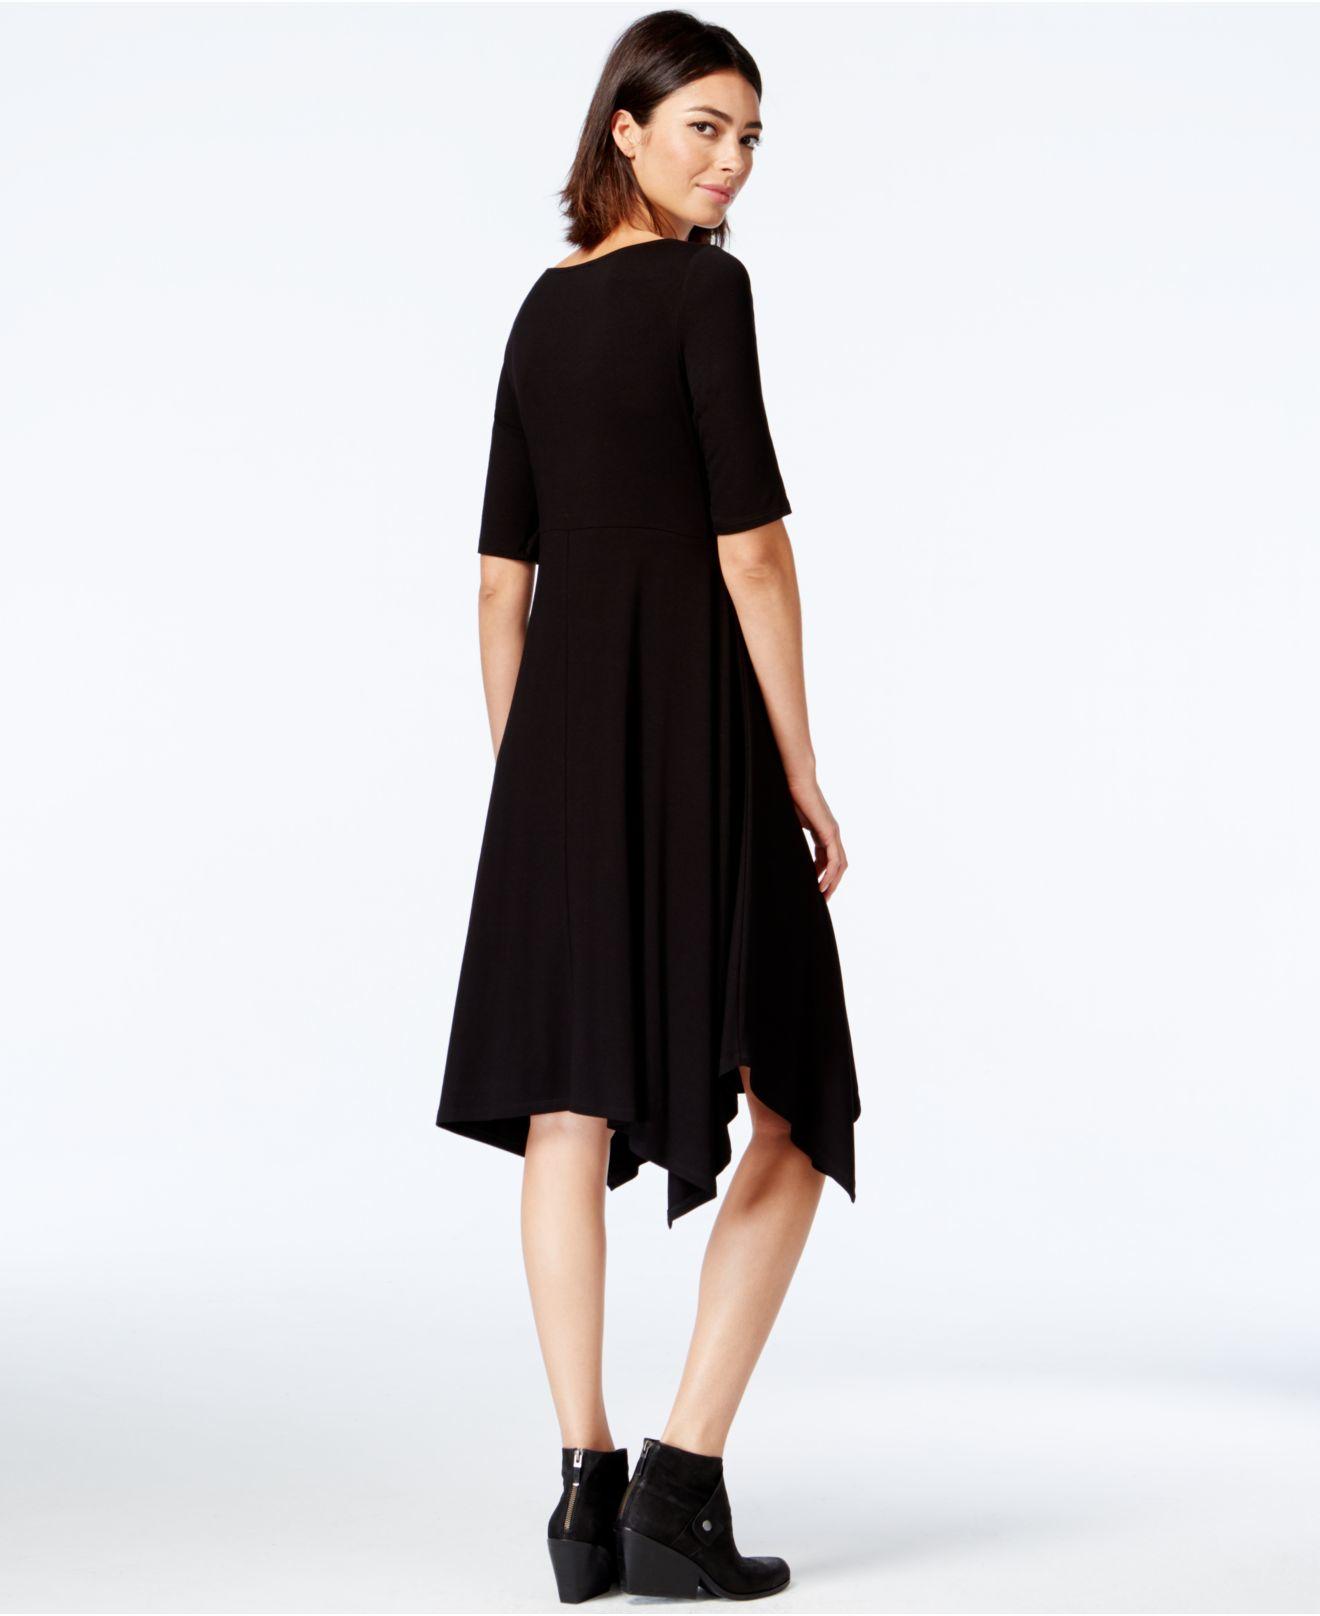 85a7bb83e57 Lyst - Eileen Fisher Short-sleeve Handkerchief-hem Dress in Black